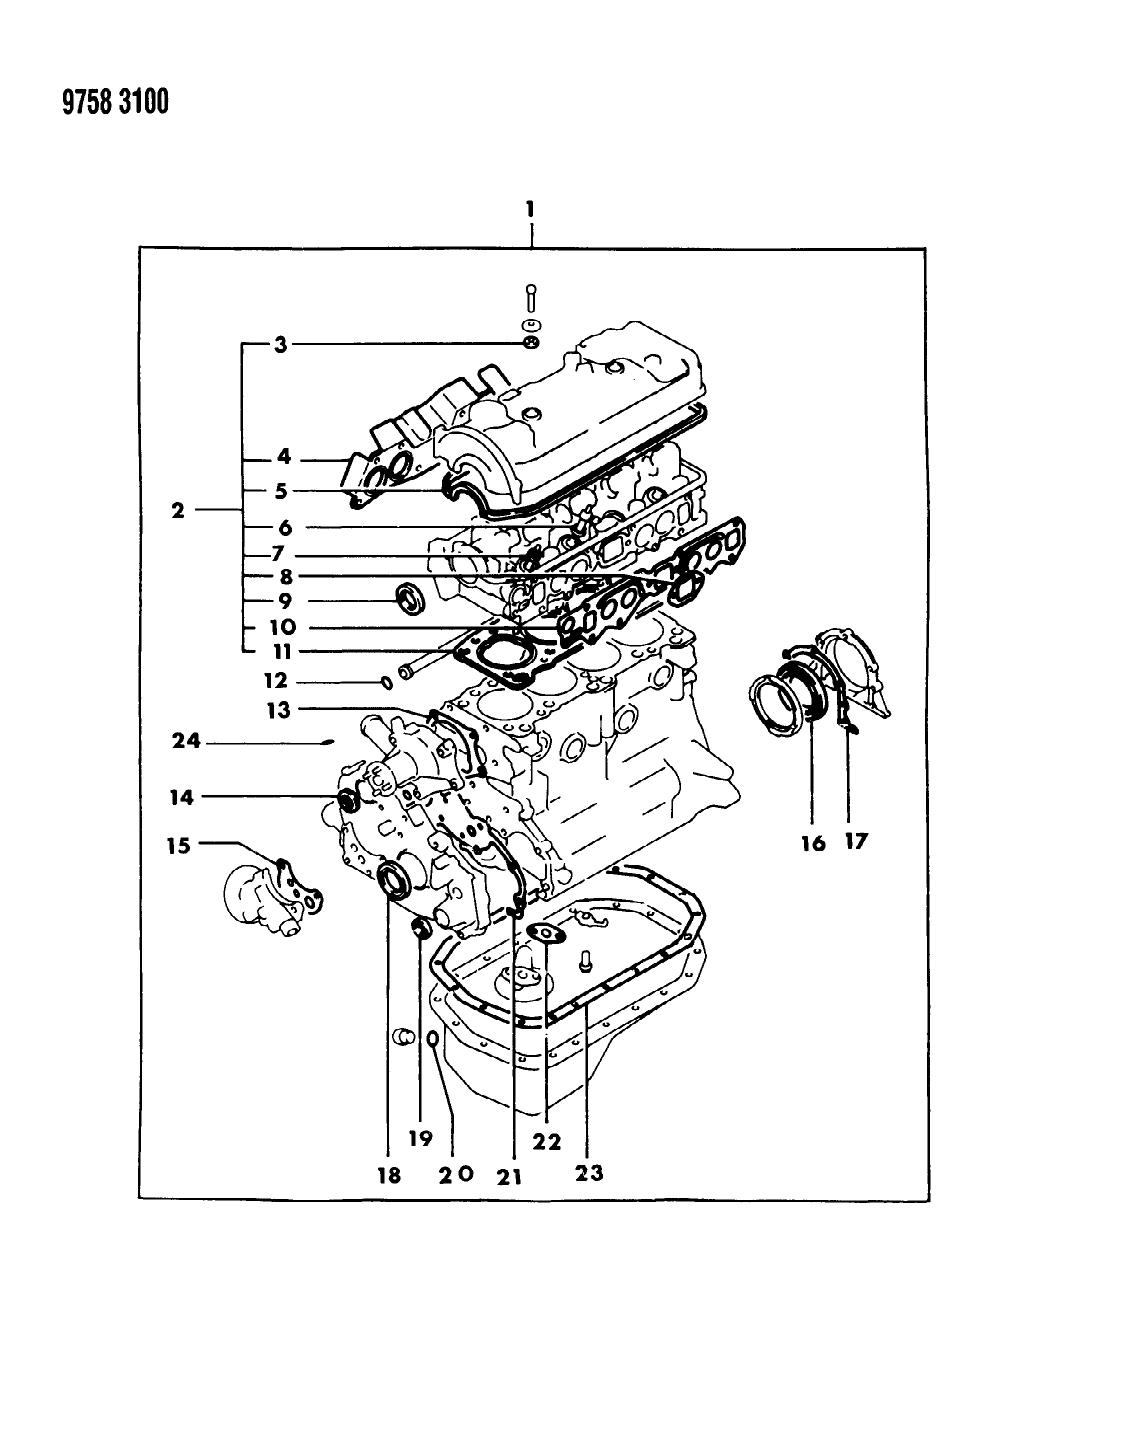 1989 Dodge Ram 50 Engine Gasket Sets - Thumbnail 1